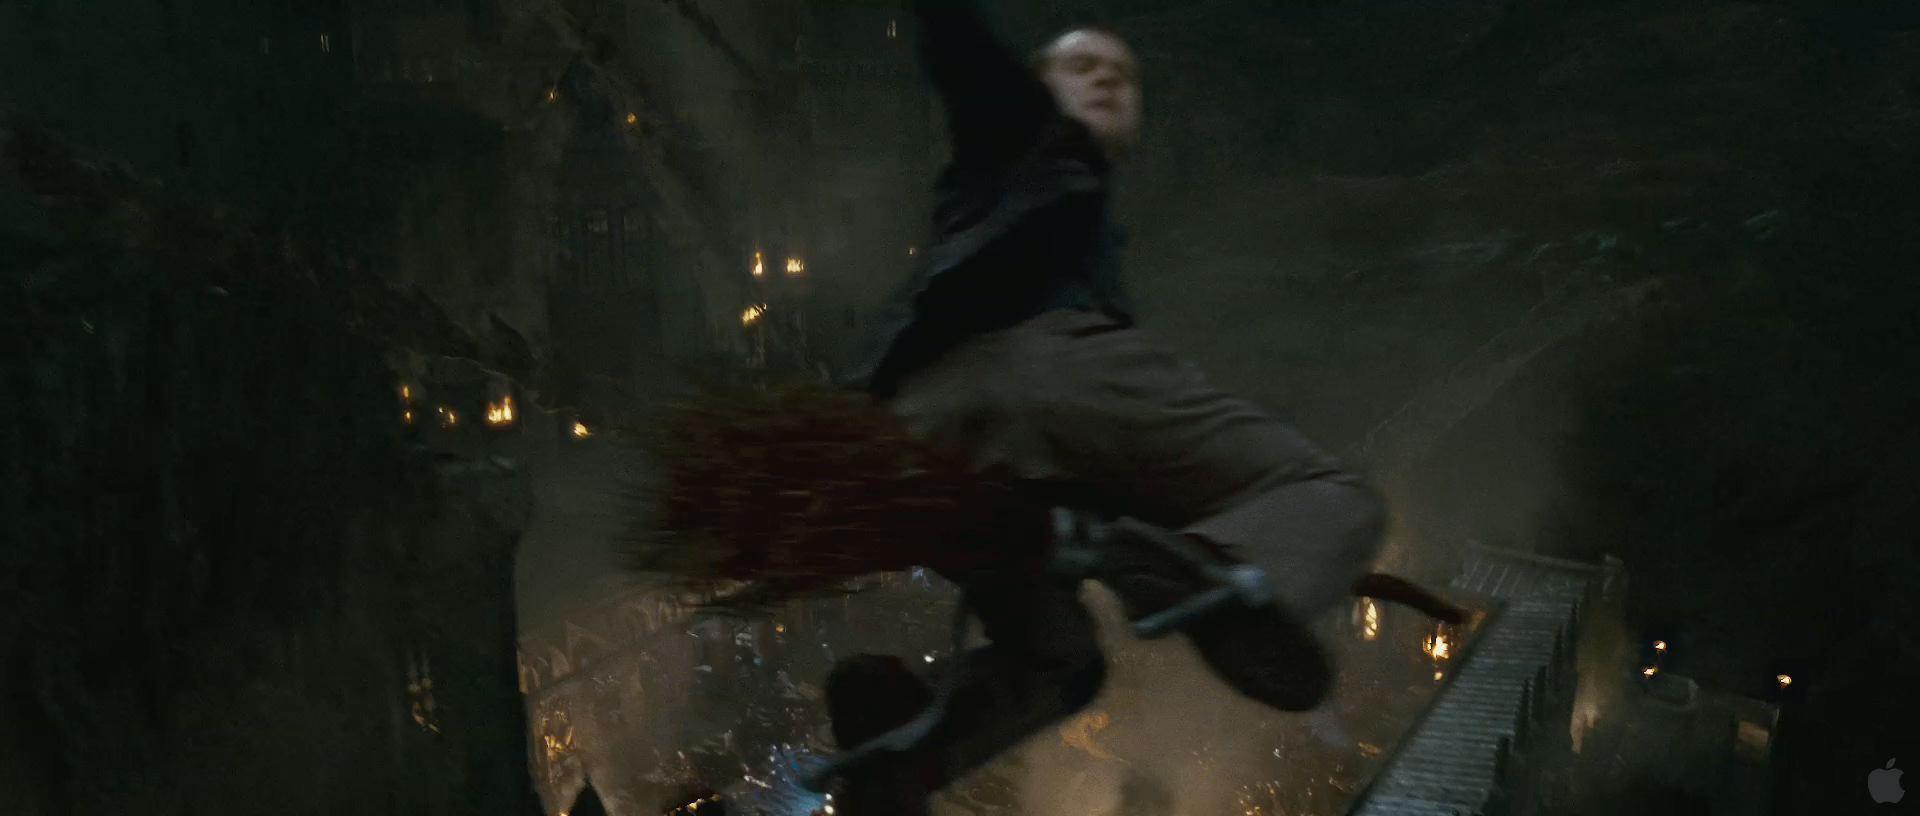 Harry Potter BlogHogwarts HP7 2 Trailer 42